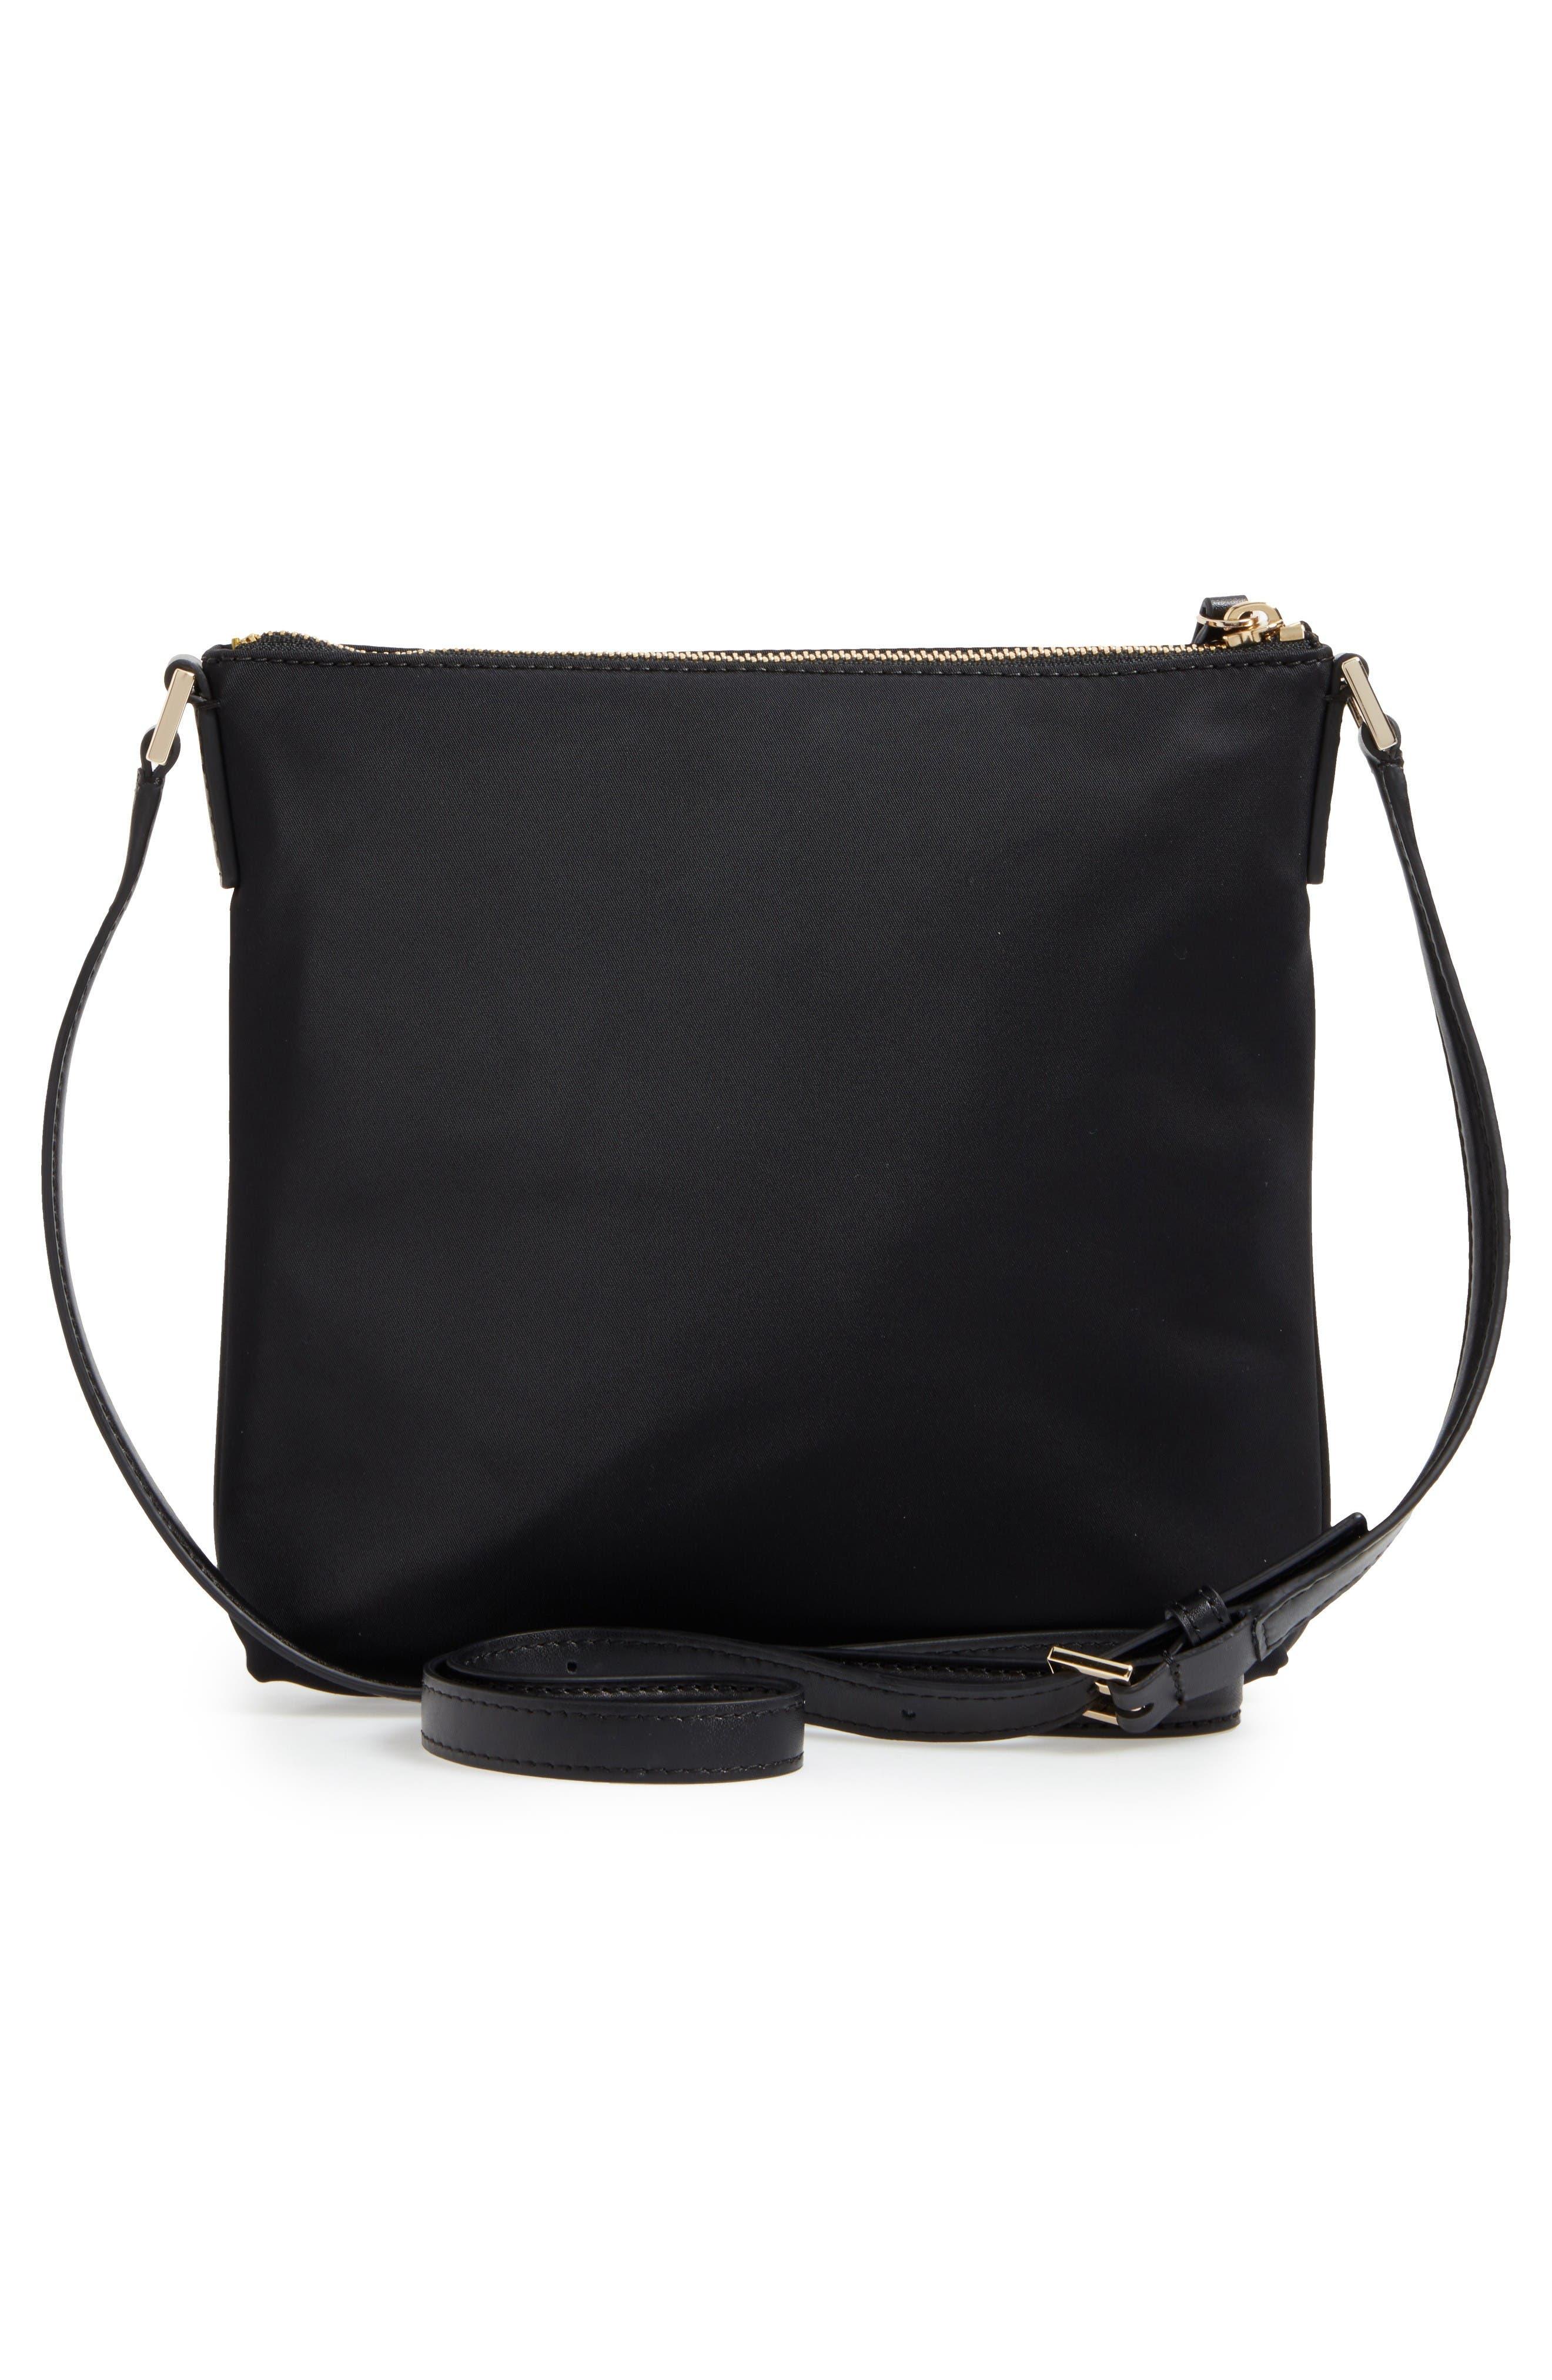 watson lane - hester crossbody bag,                             Alternate thumbnail 3, color,                             Black